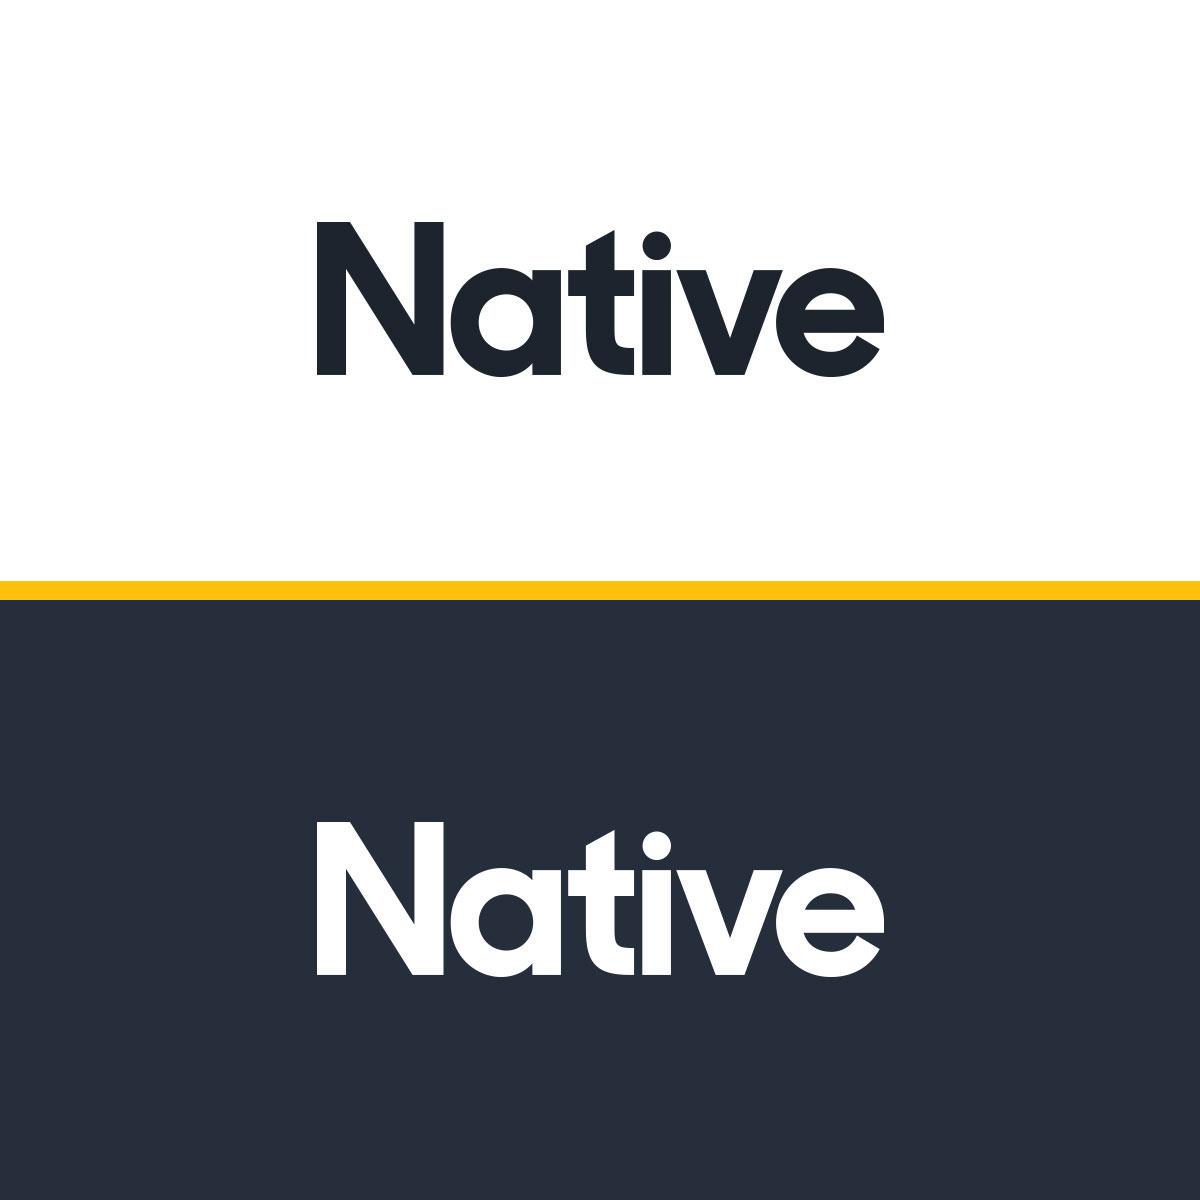 Native branding